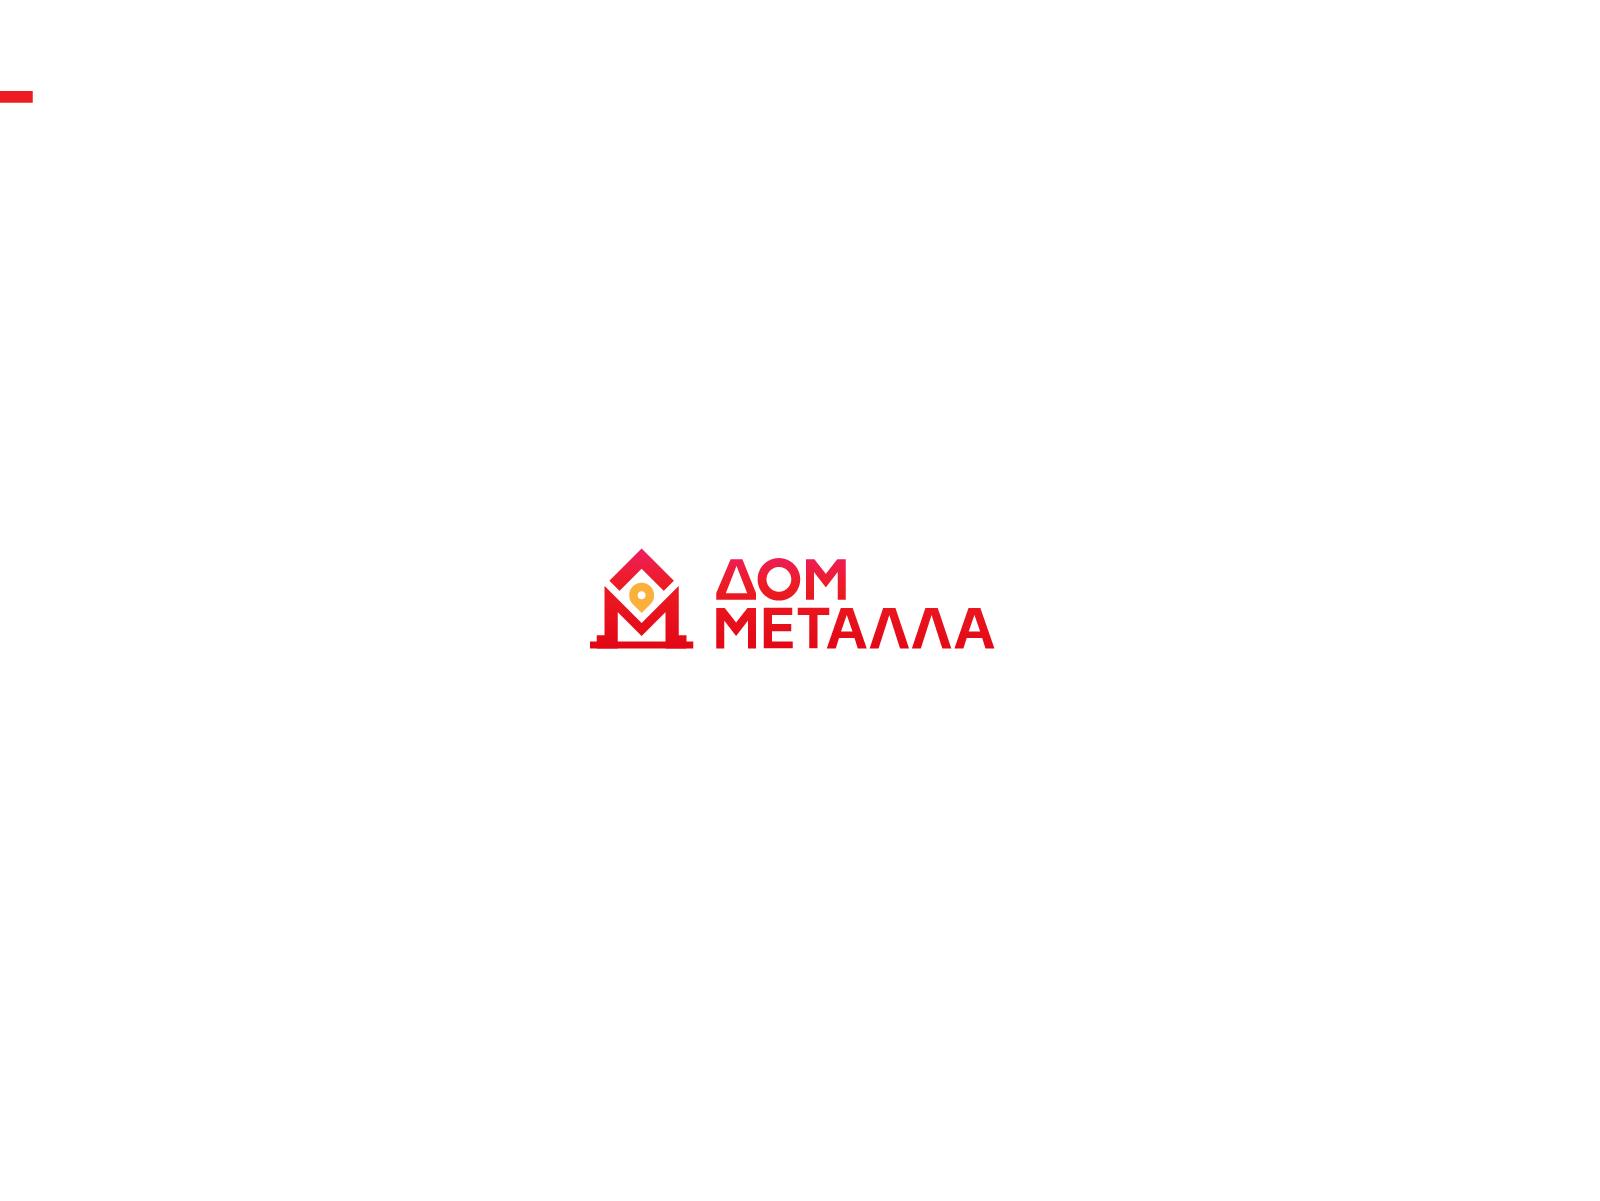 Разработка логотипа фото f_7855c59ac5db884c.jpg